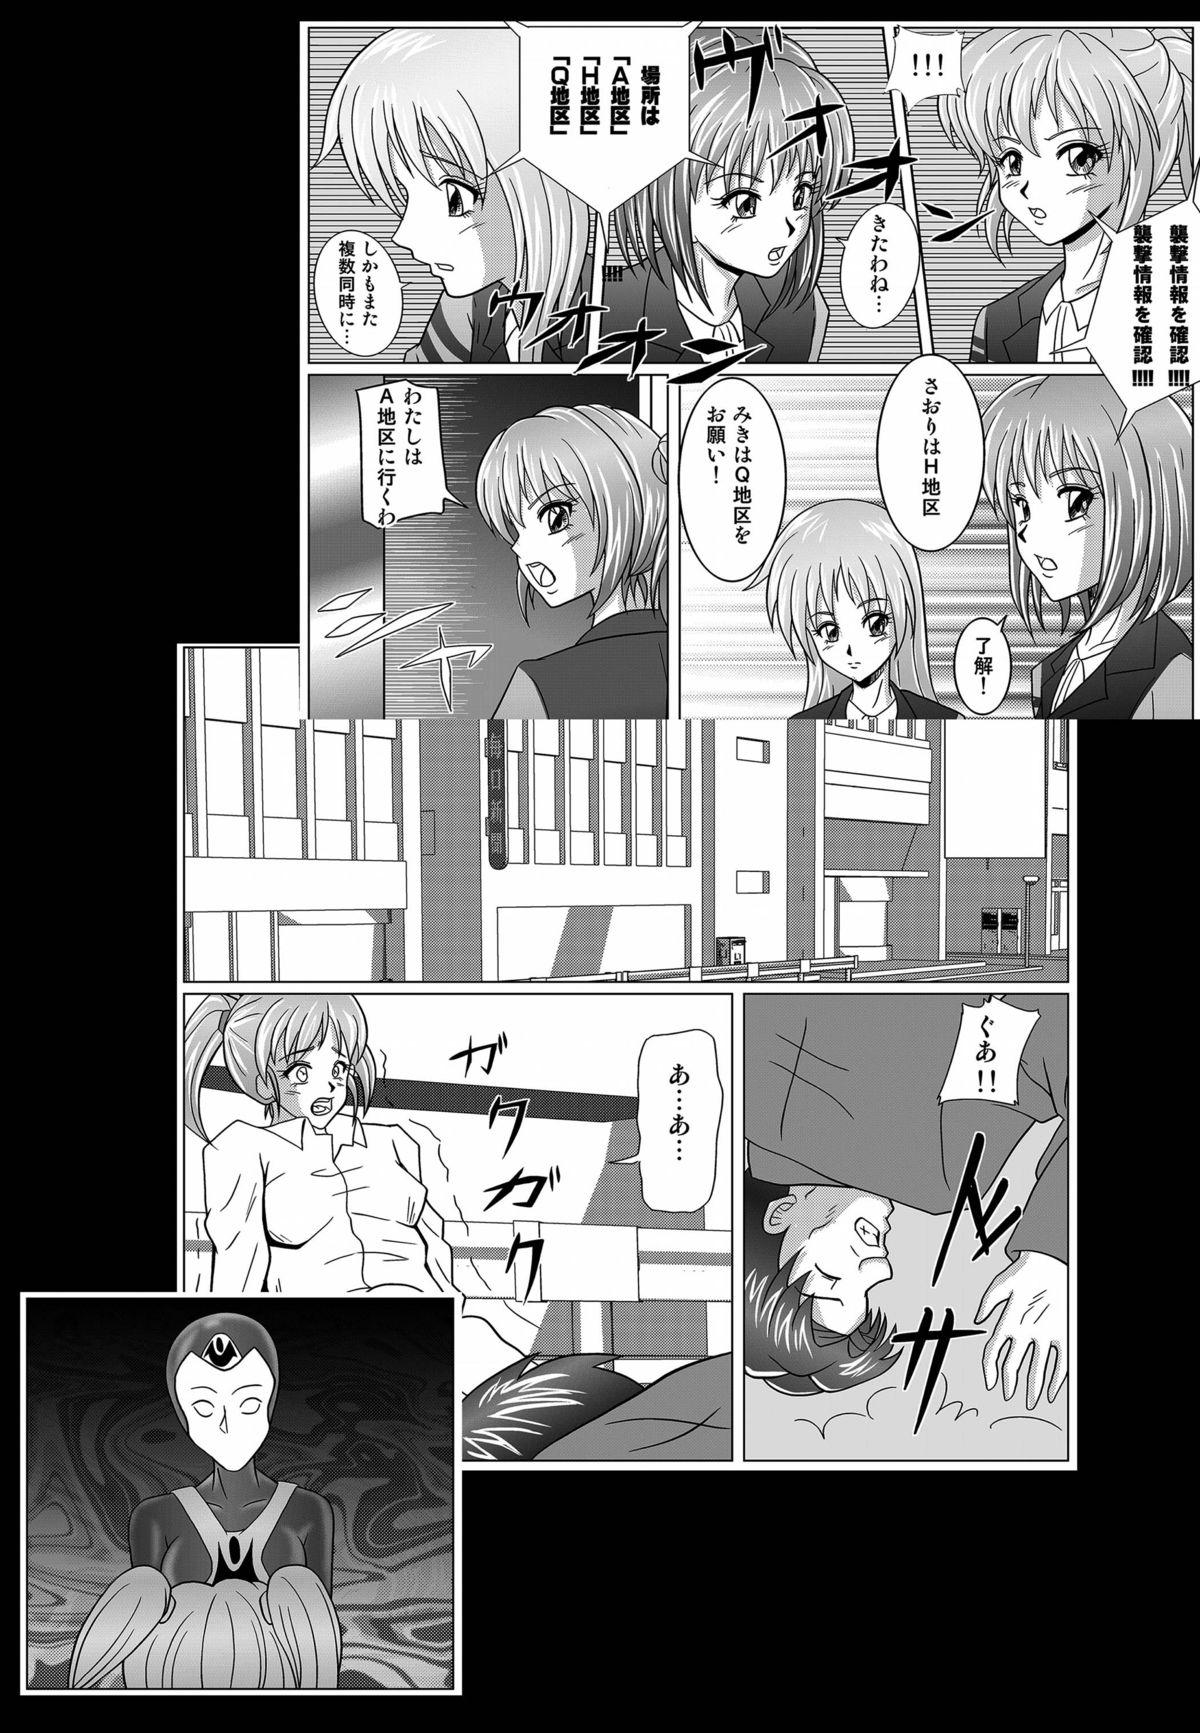 [Macxe's (monmon)] Tokubousentai Dinaranger ~Heroine Kairaku Sennou Keikaku~ Vol.01/02/03 (Renkaban) [Digital] 120